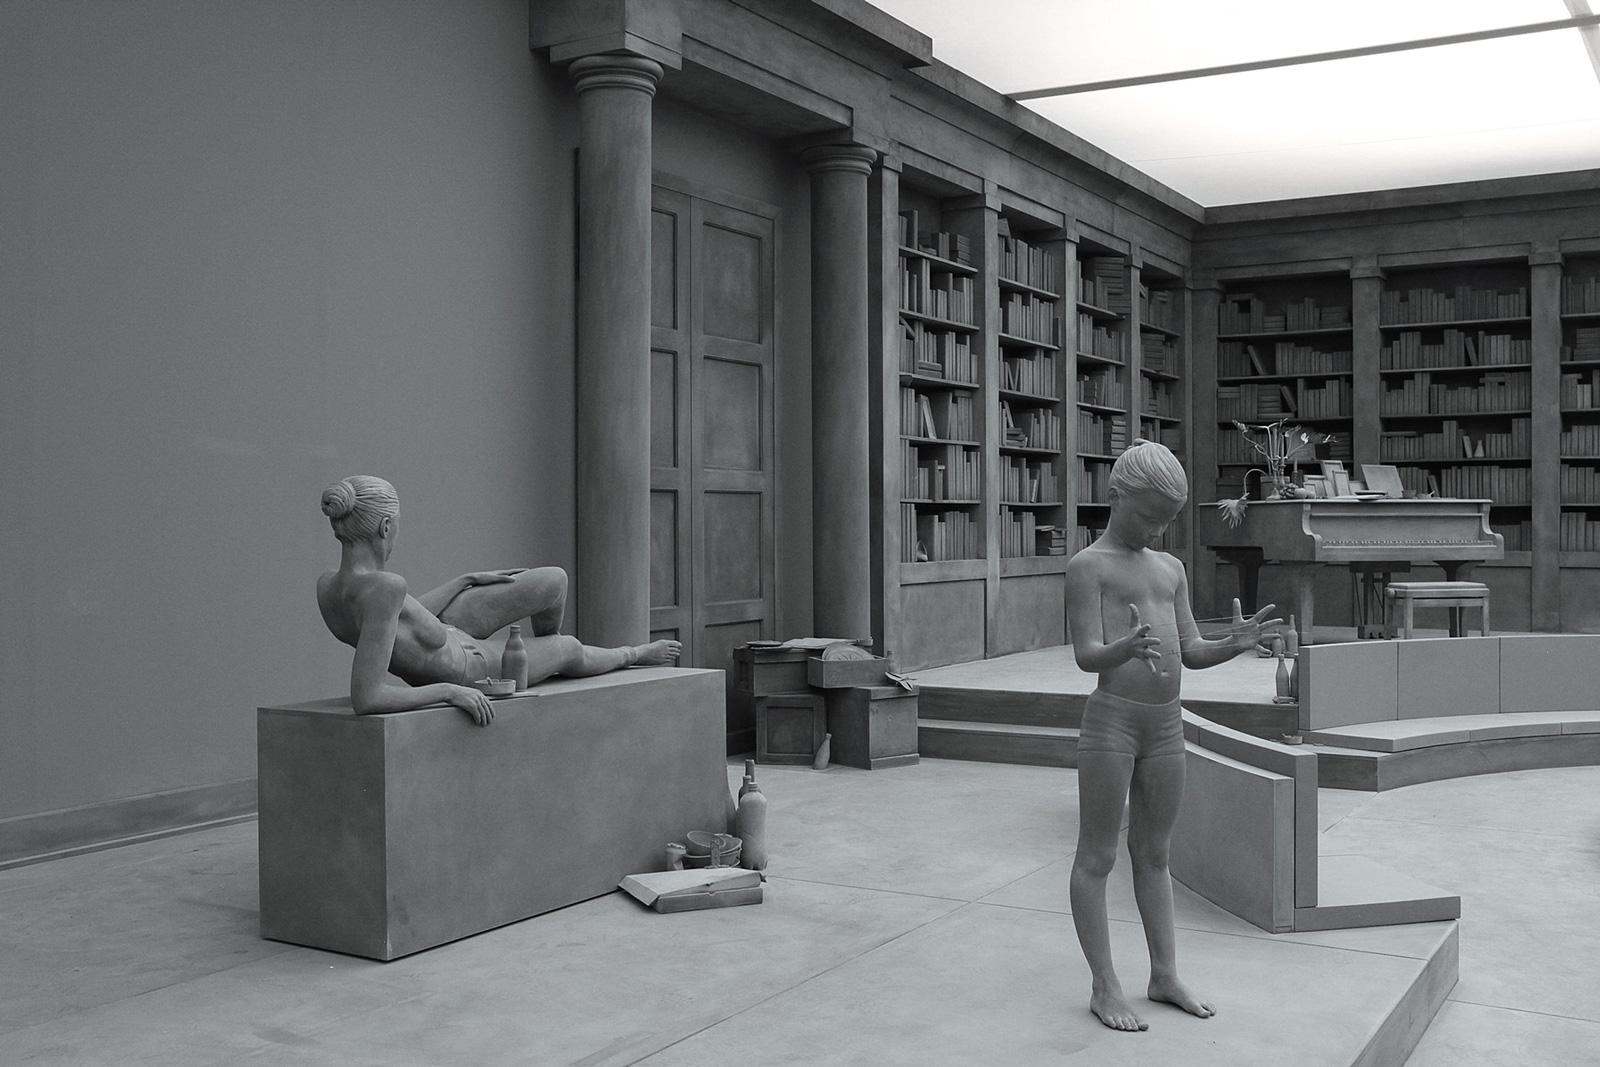 Hans Op de Beeck, The Collector's House, sculptural installation, 2016